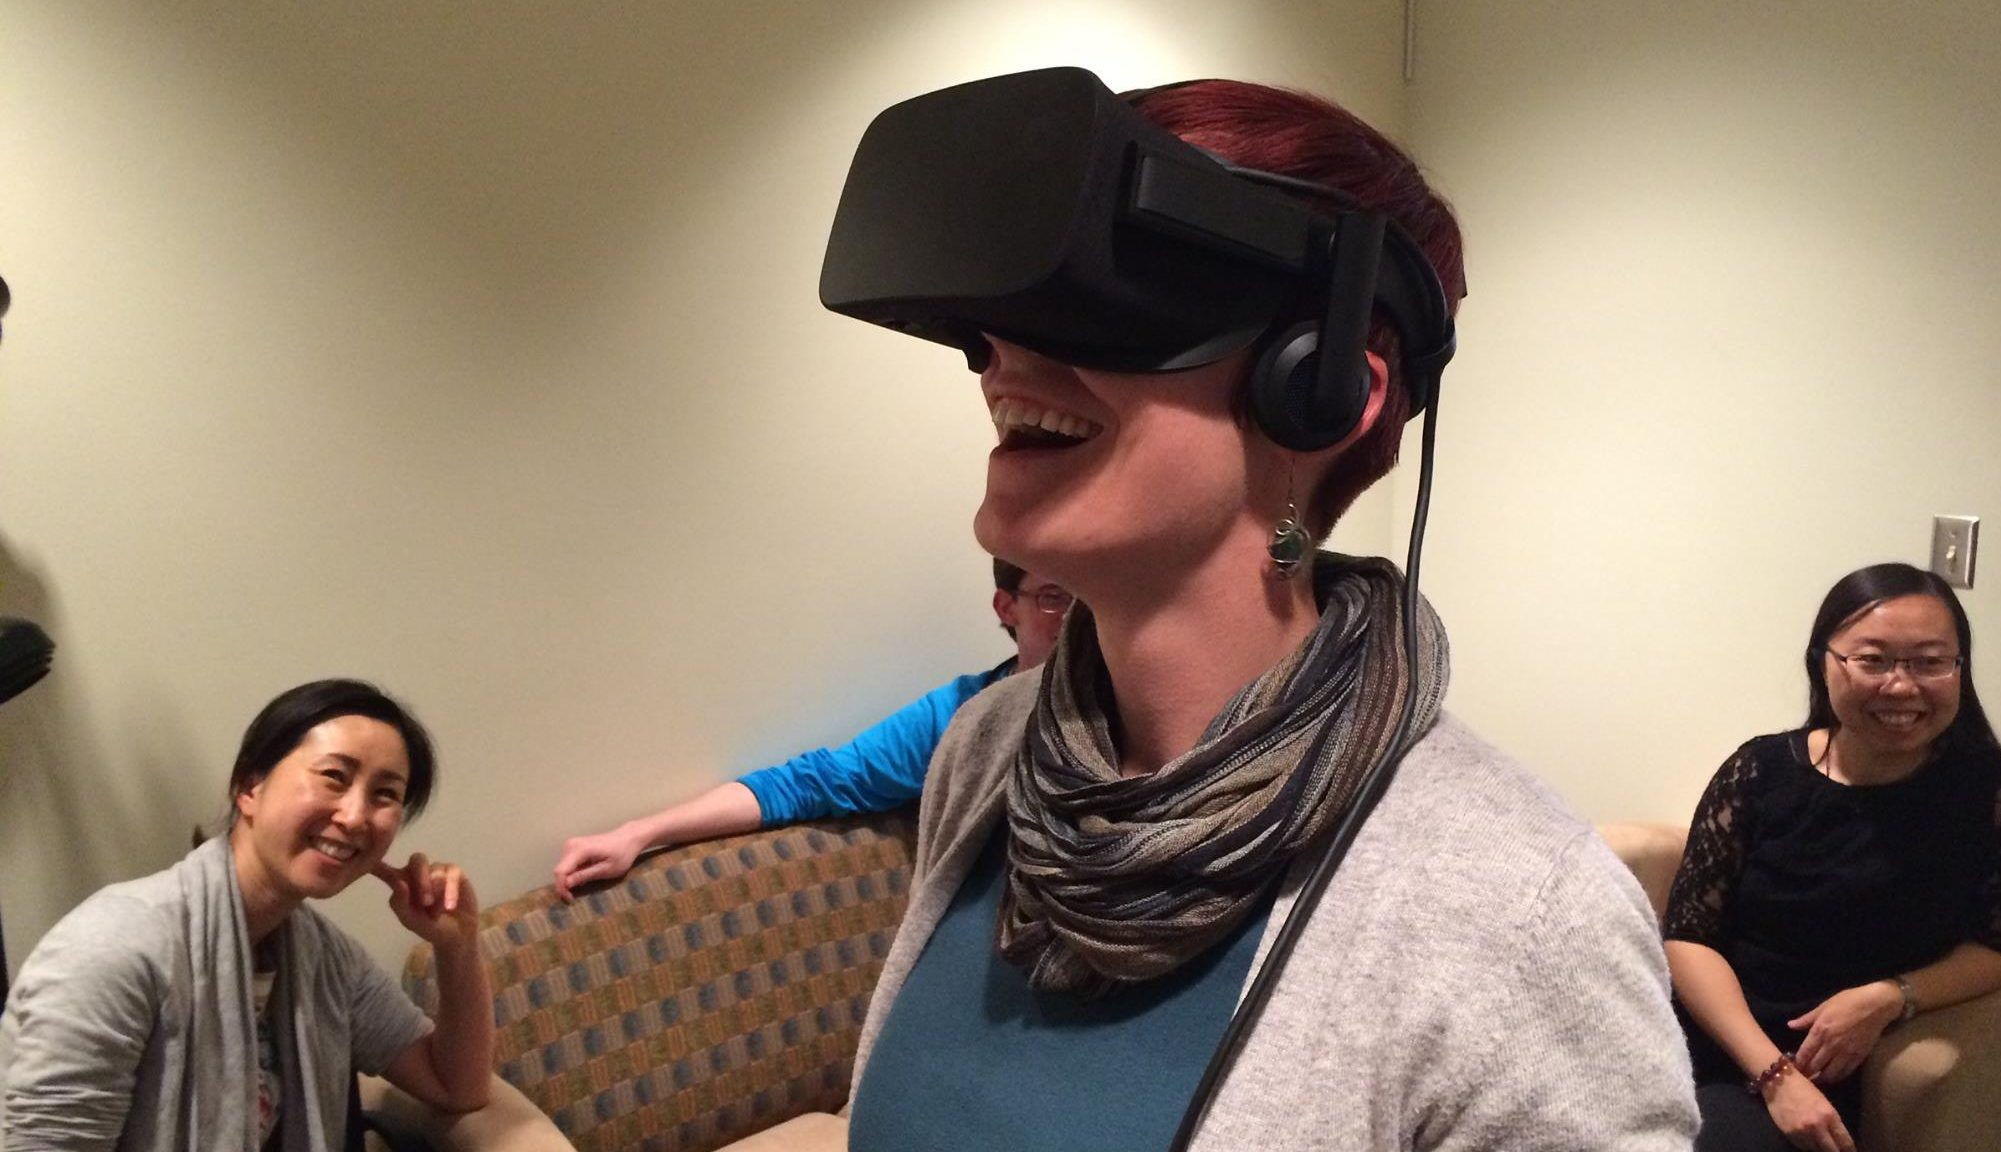 Myiah using VR headset